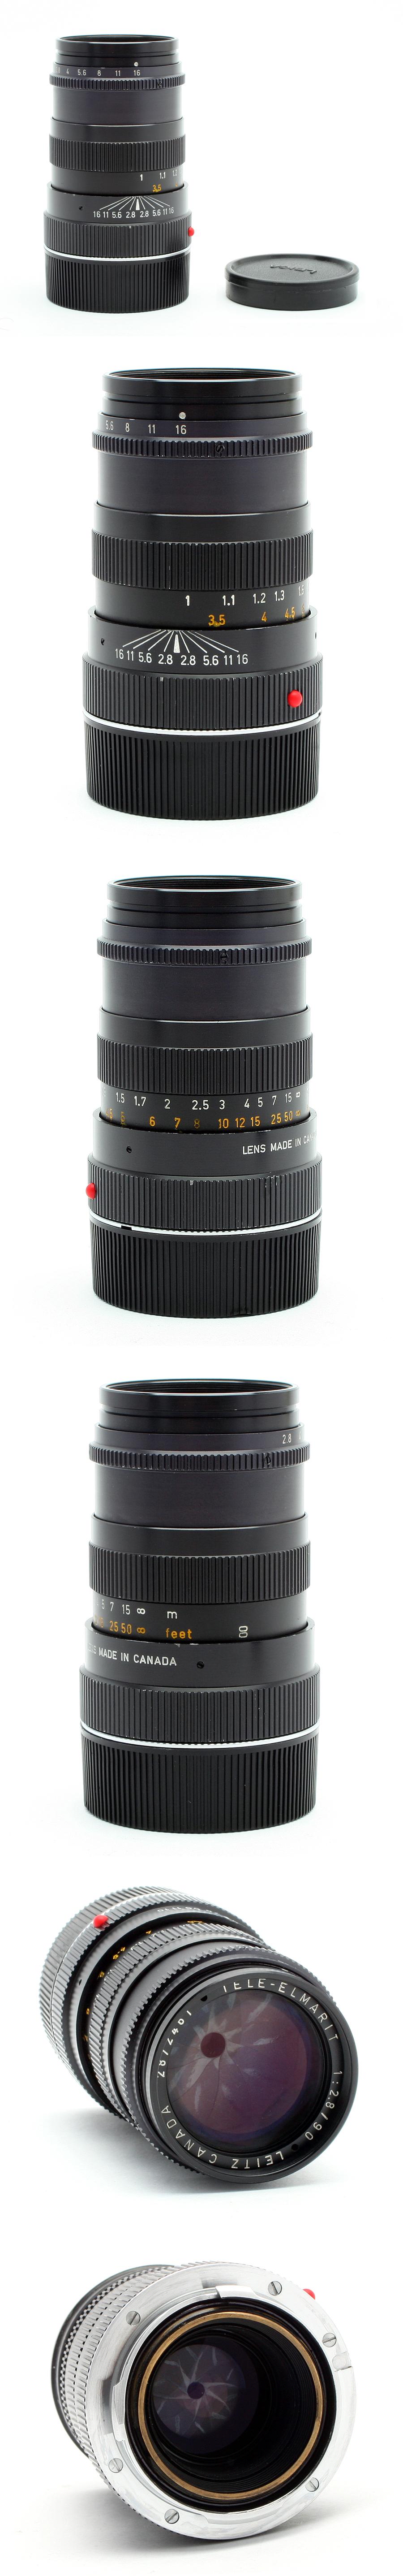 Black Leica 90mm f2.8 Tele-Elmarit Leica M Mount Manual ...